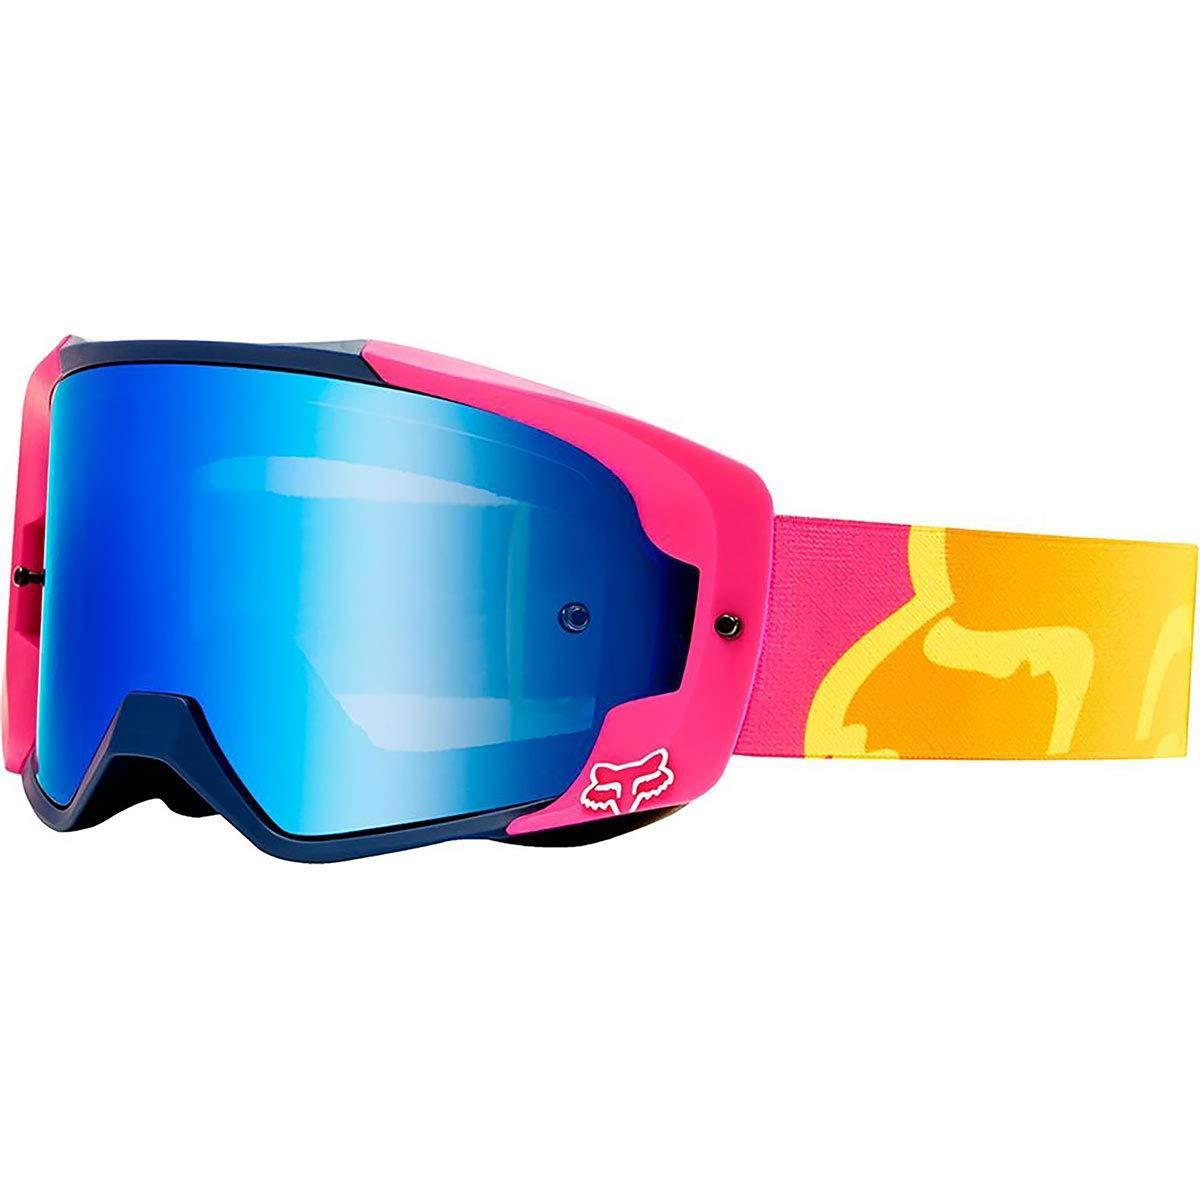 Fox Racing Vue Idol Men's Off-Road Motorycle Goggles - Multi/One Size